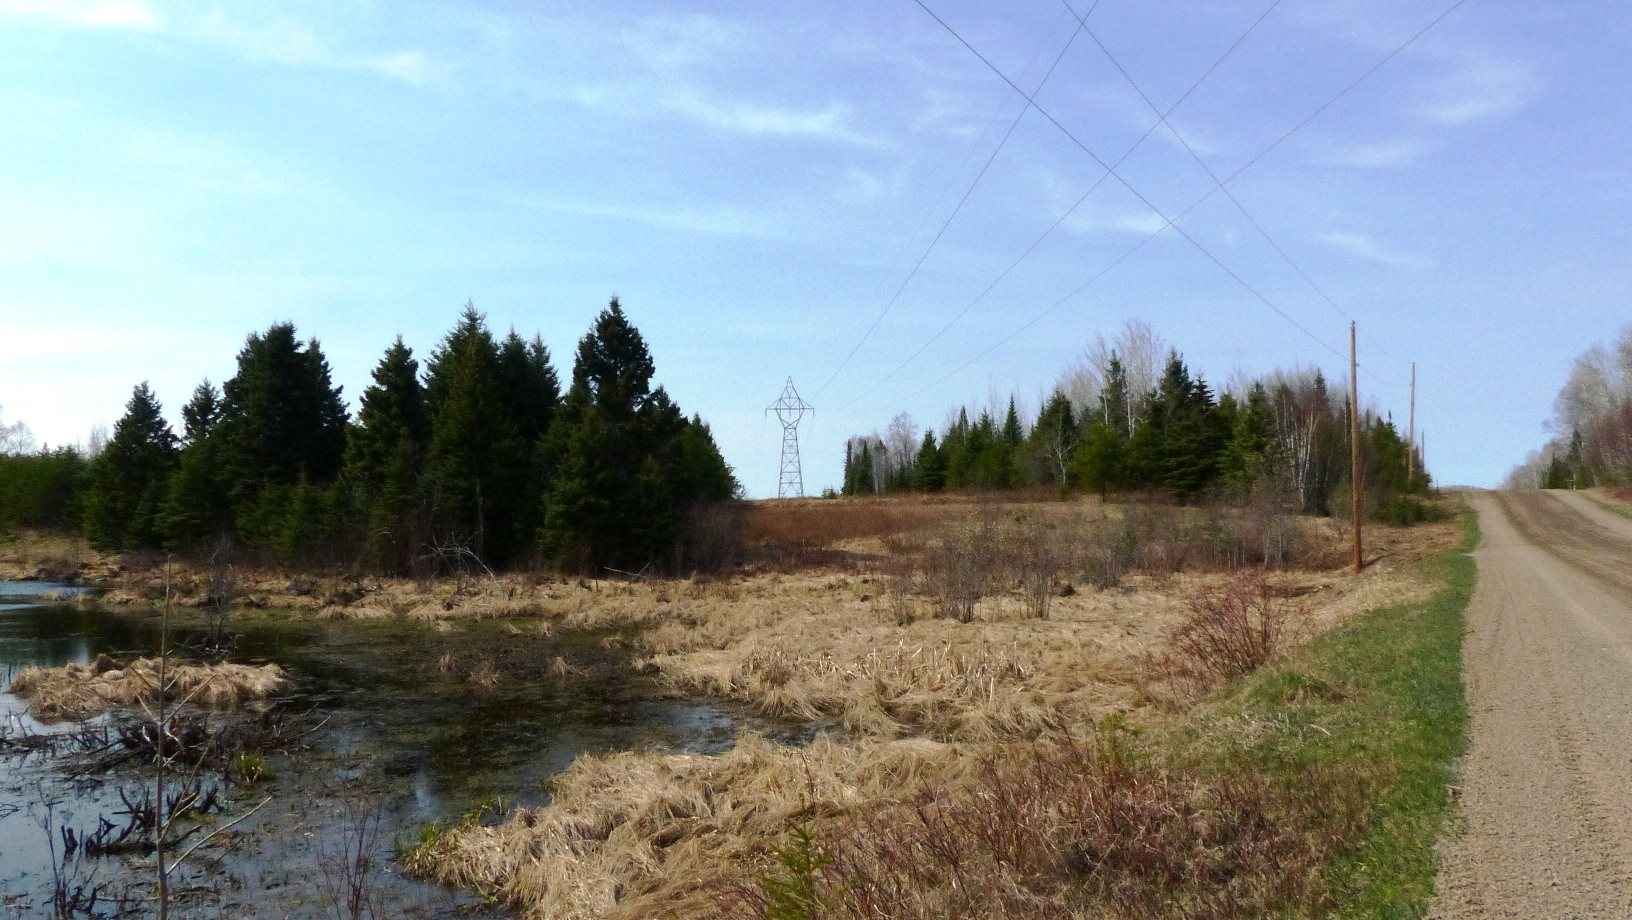 000 Pokki Road, Conmee Township, Ontario (ID TB210923)